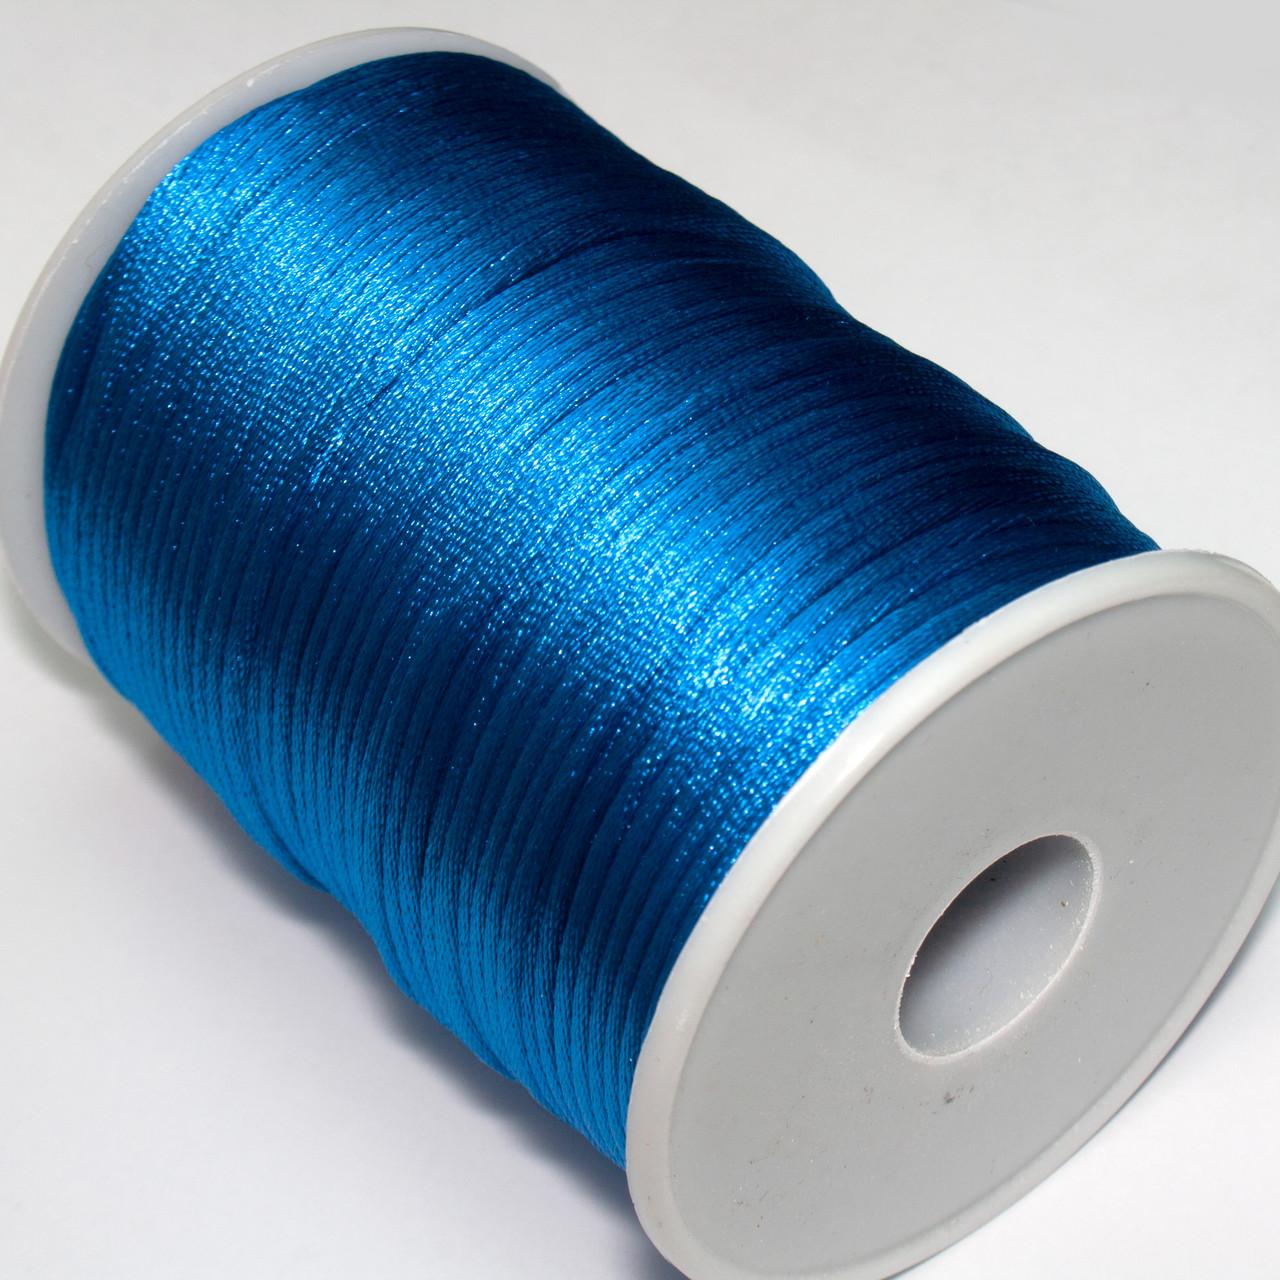 Шнур корсетный (сатиновый, шелковый) 2мм цена за 100 ярдов. Цвет - ЛАЗУРНЫЙ